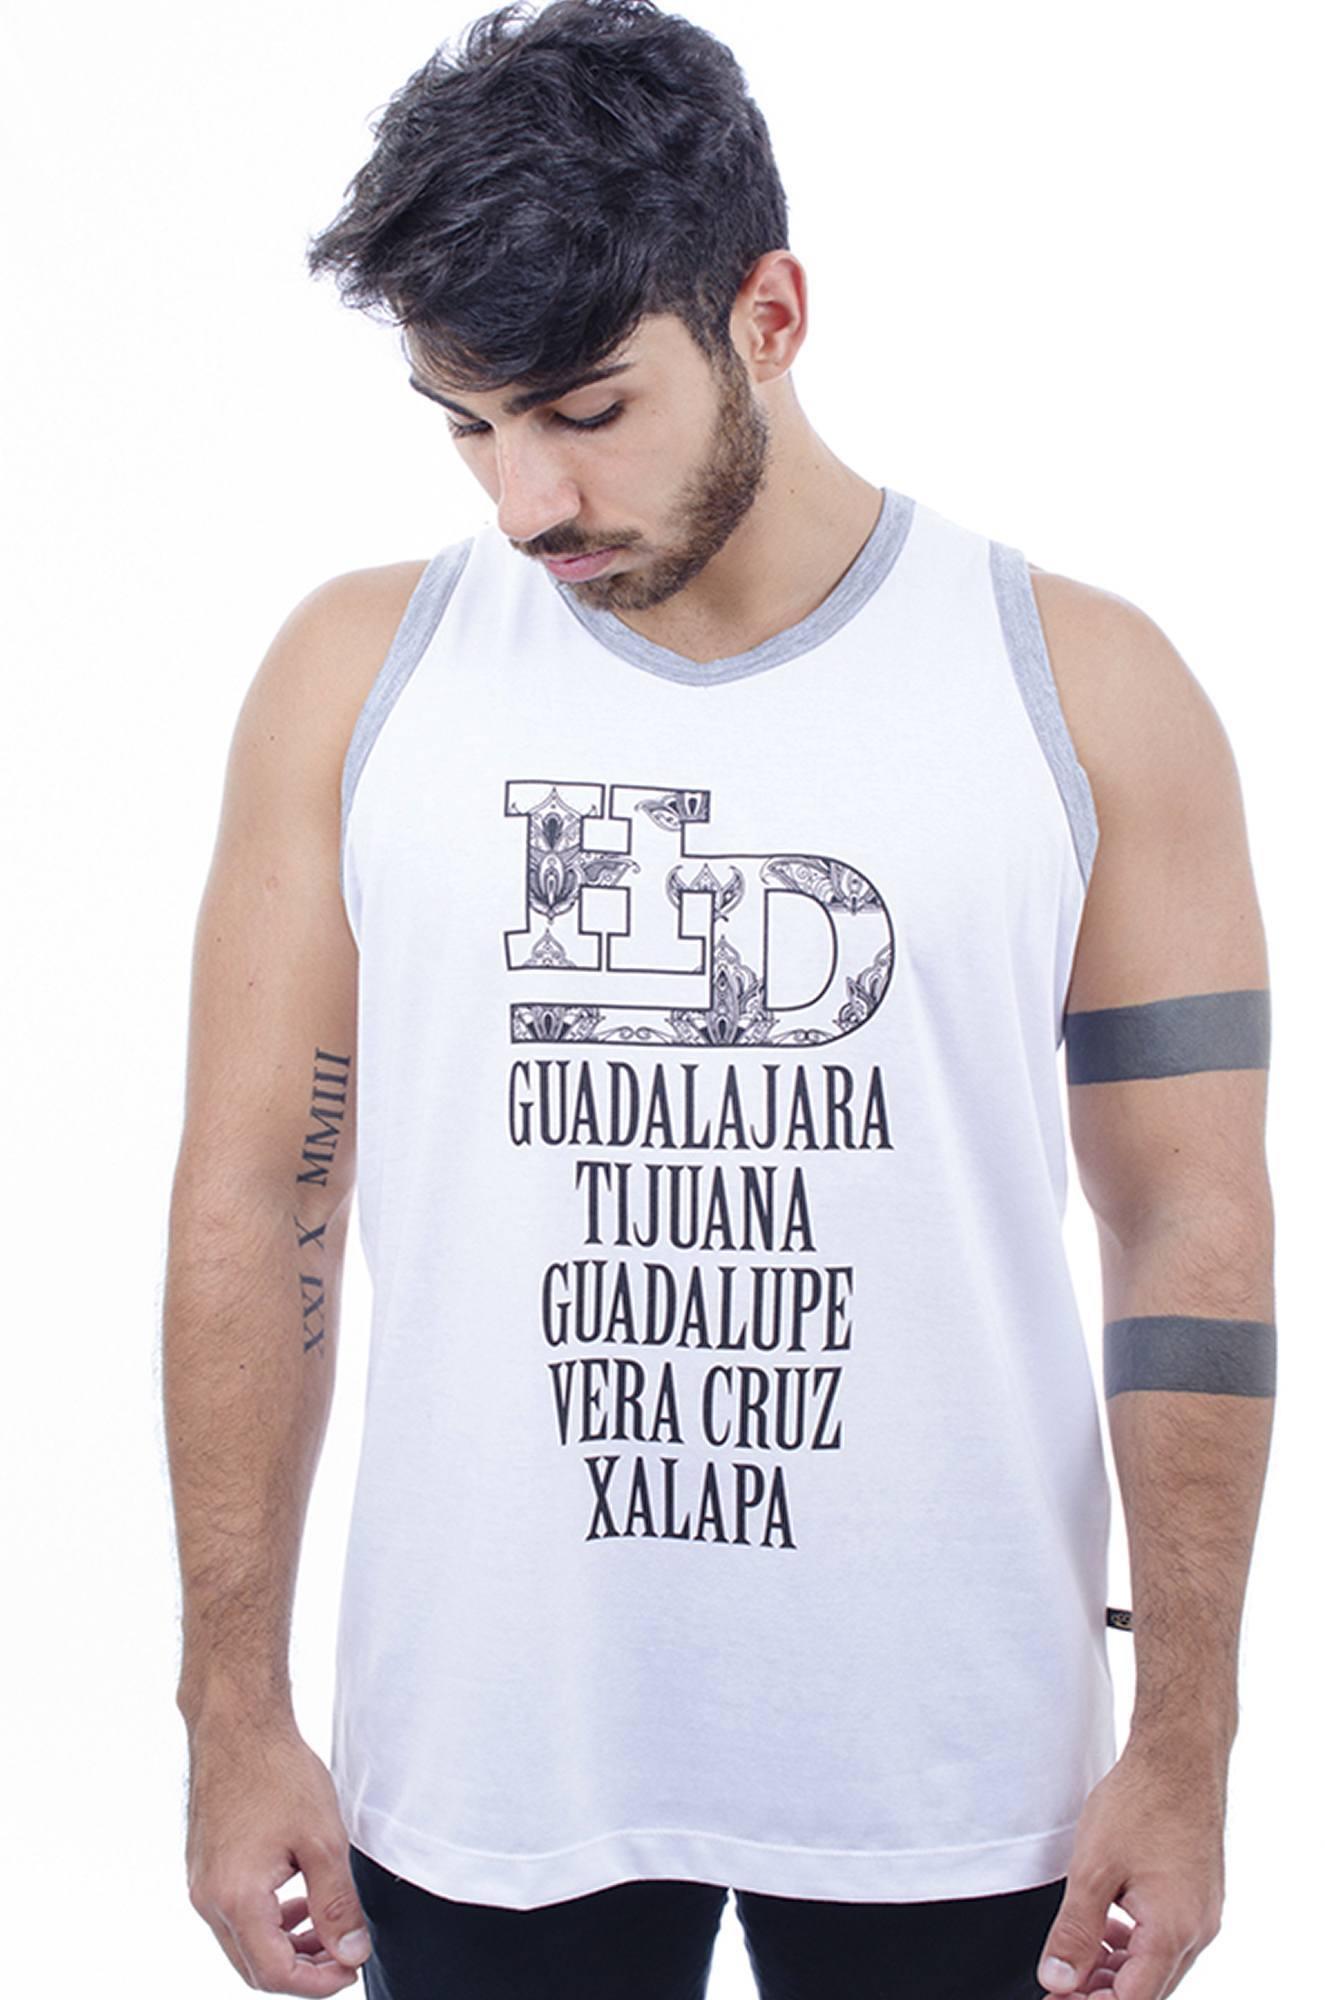 Camiseta Regata Masculina Hardivision Xalapa Branc. 09675e13251